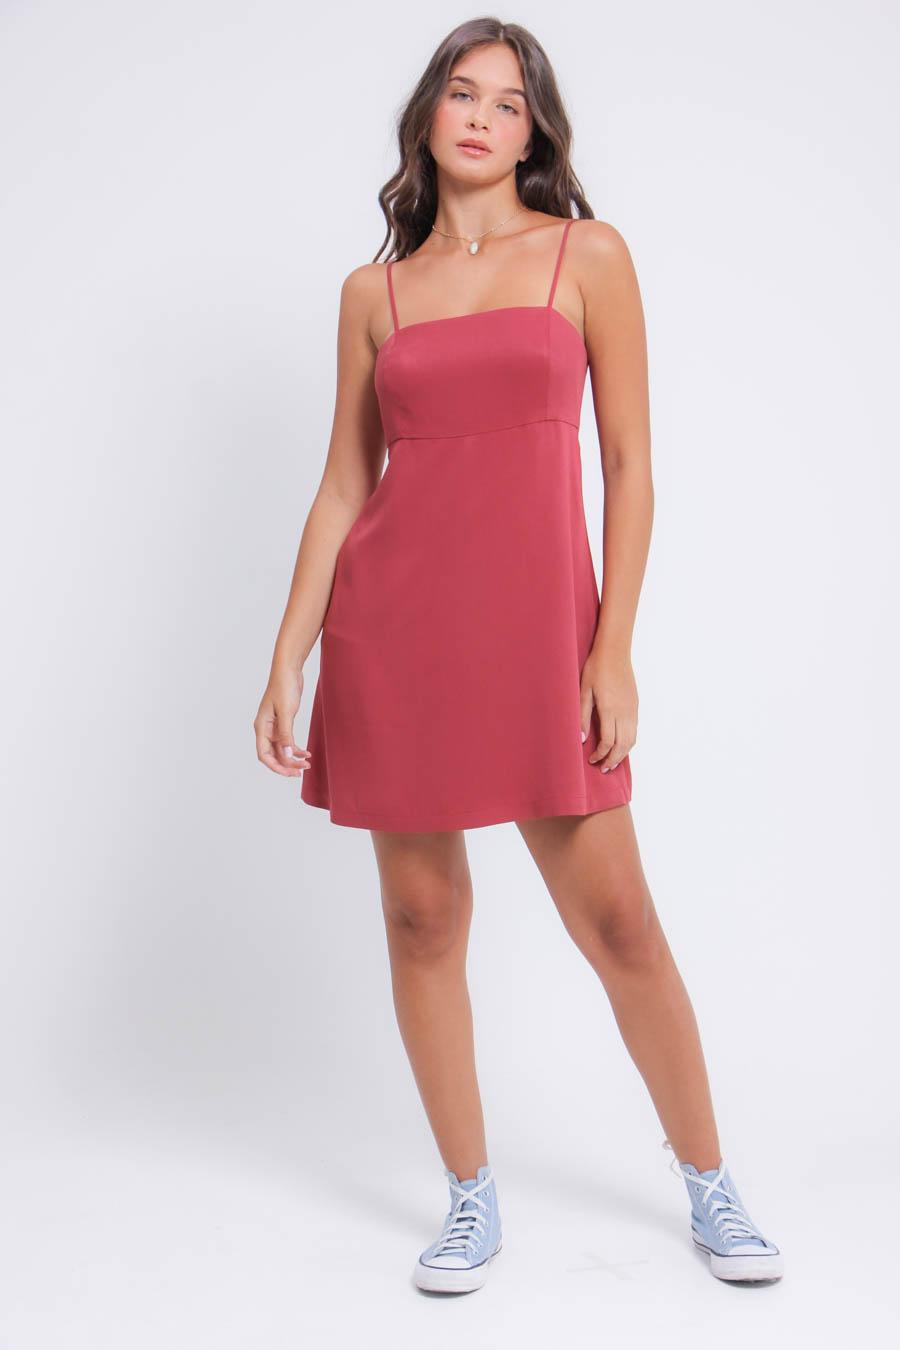 Vestido galileia